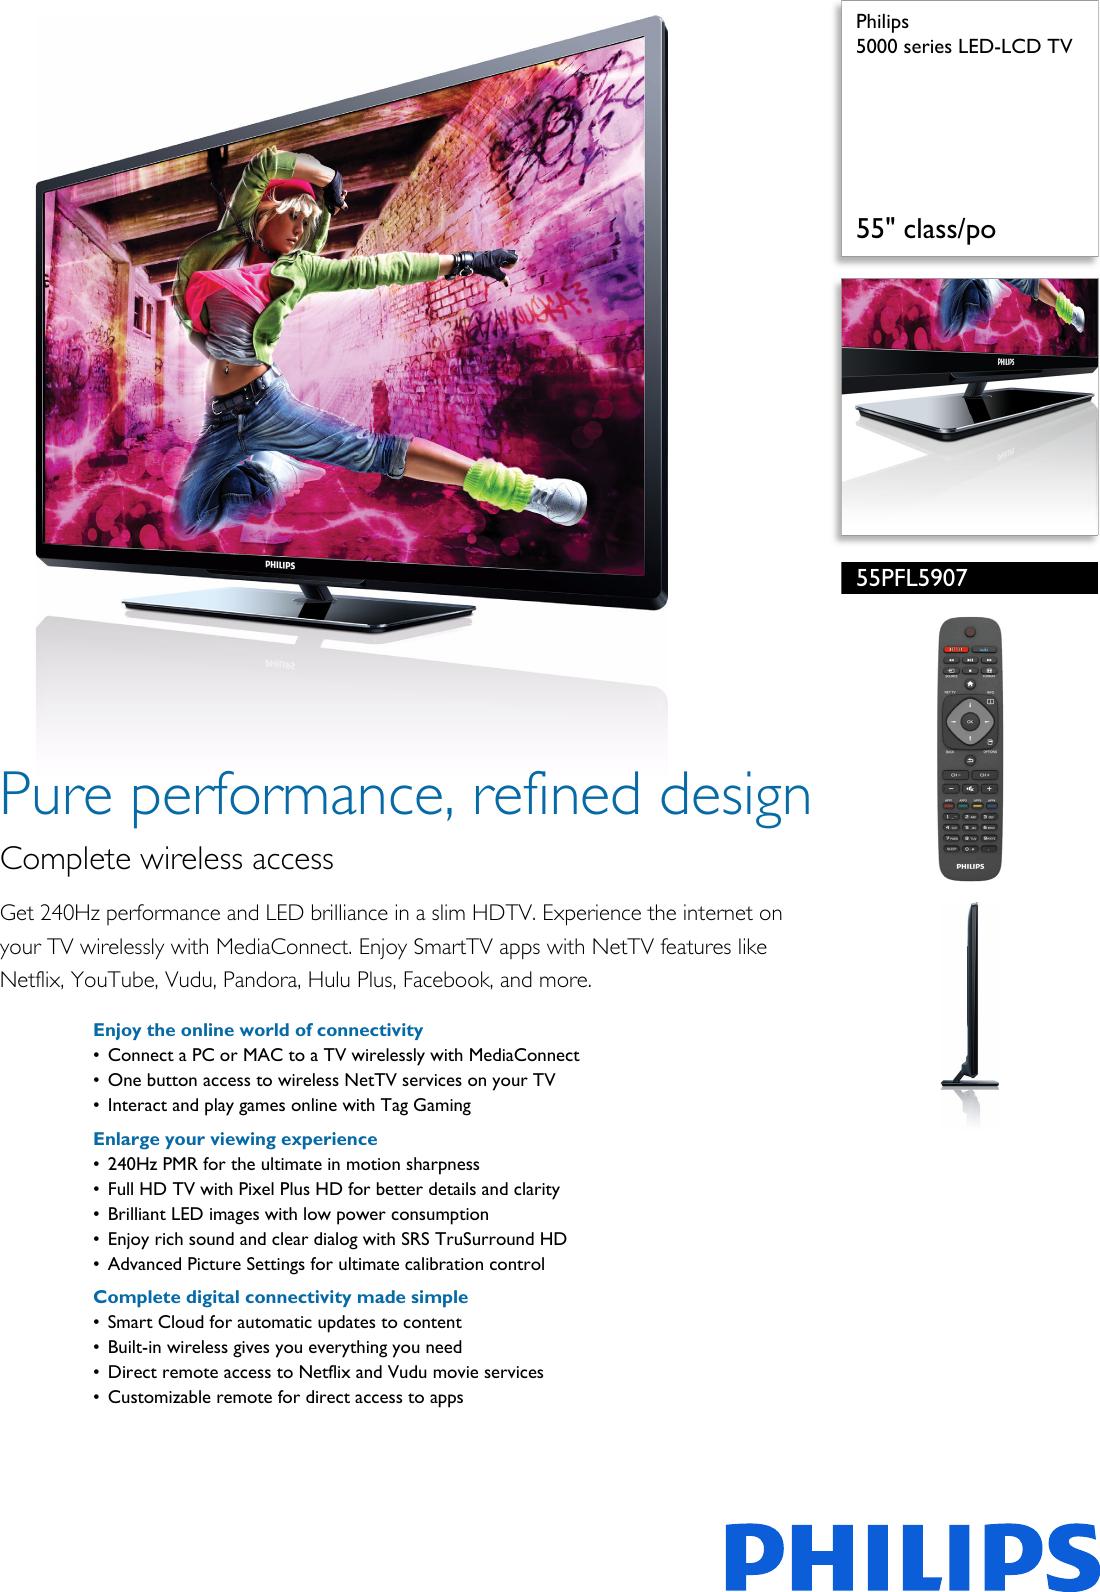 Philips 55PFL5907/F7 5000 Series LED LCD TV User Manual